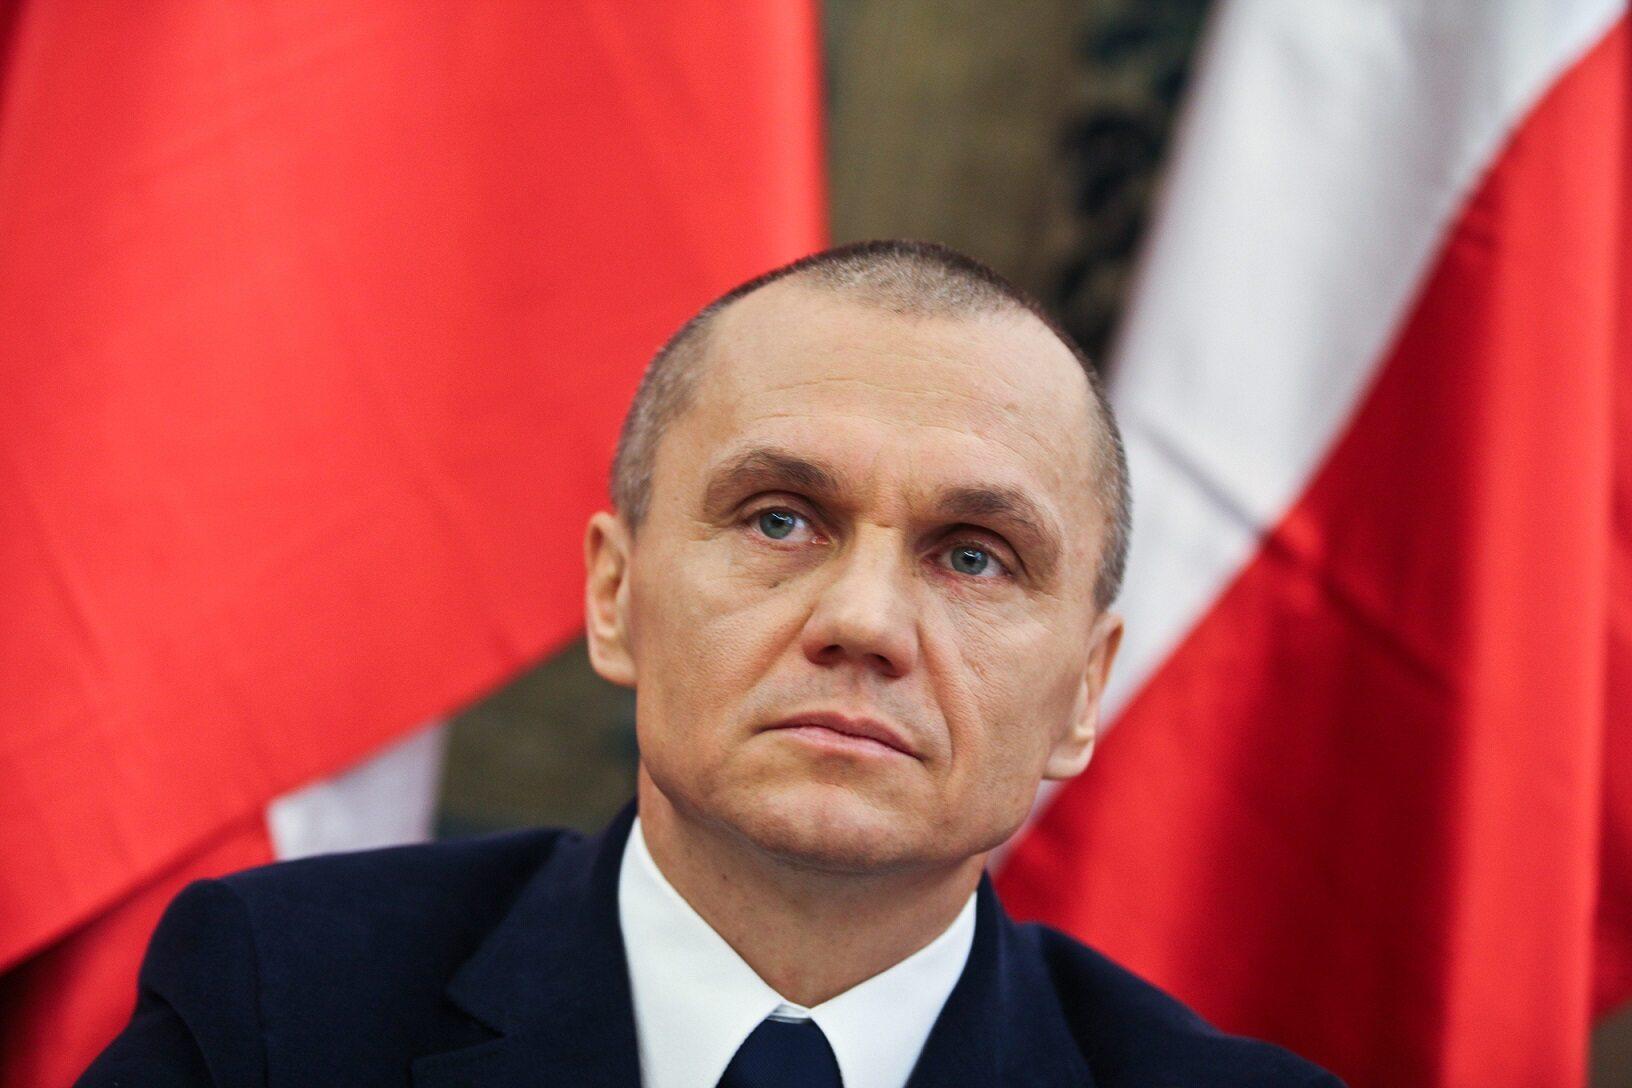 Gen. Roman Polko